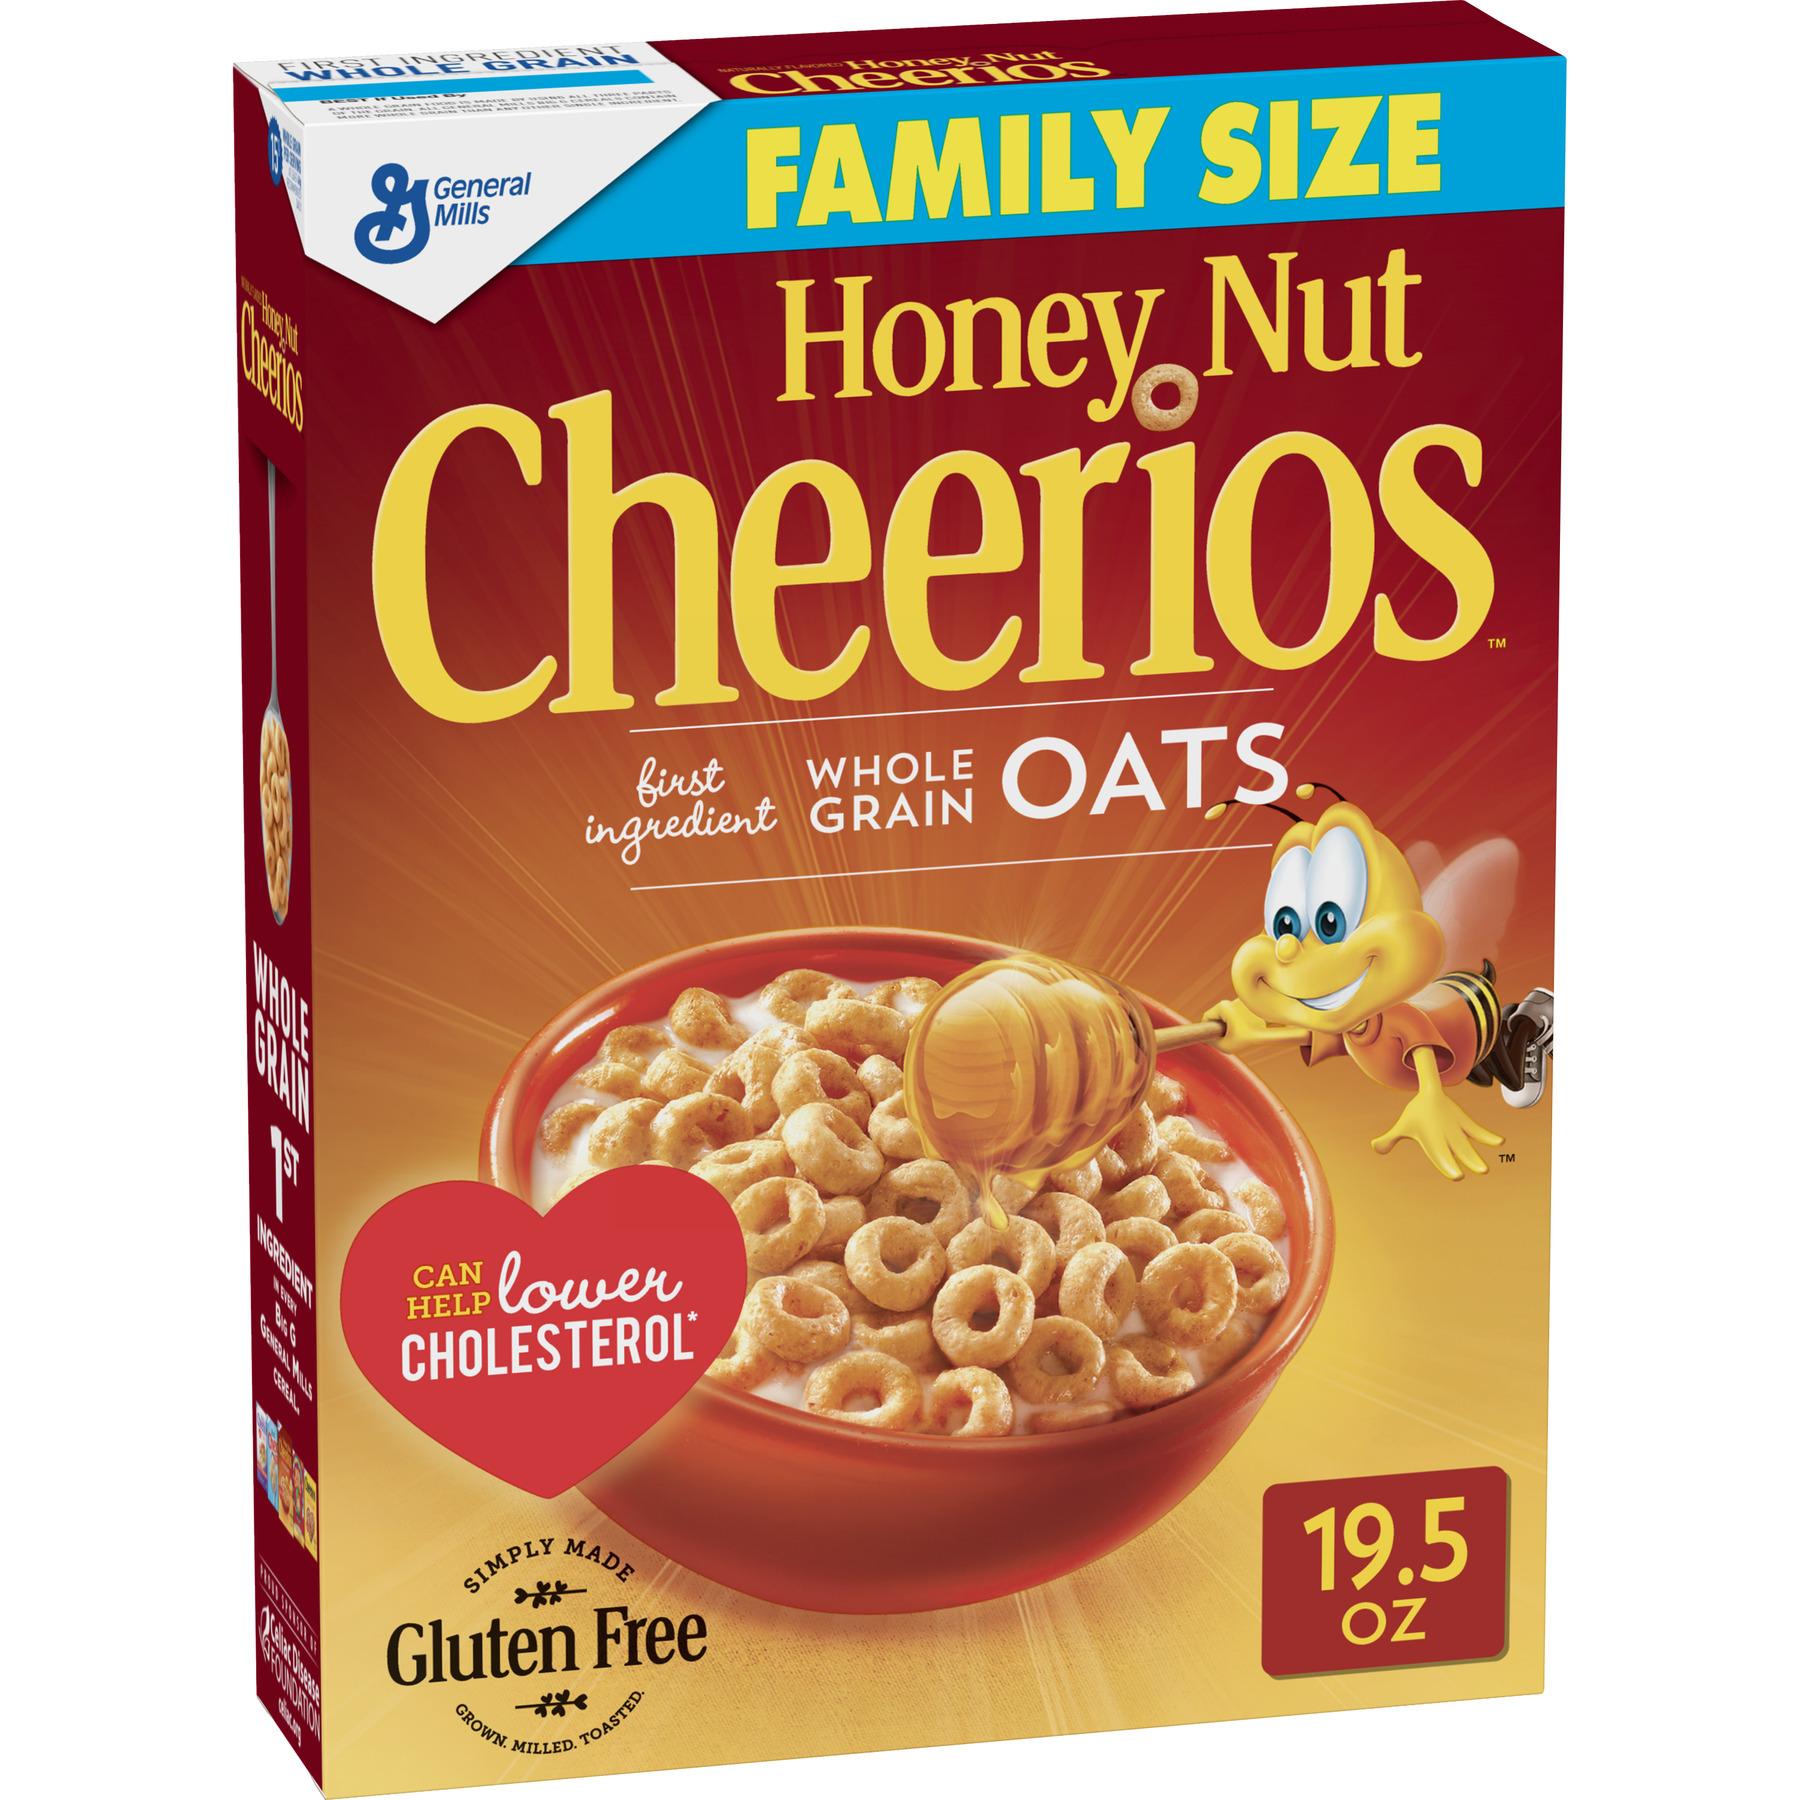 General Mills, Honey Nut Cheerios Gluten Free Breakfast Cereal, Family Size 19.5 Oz